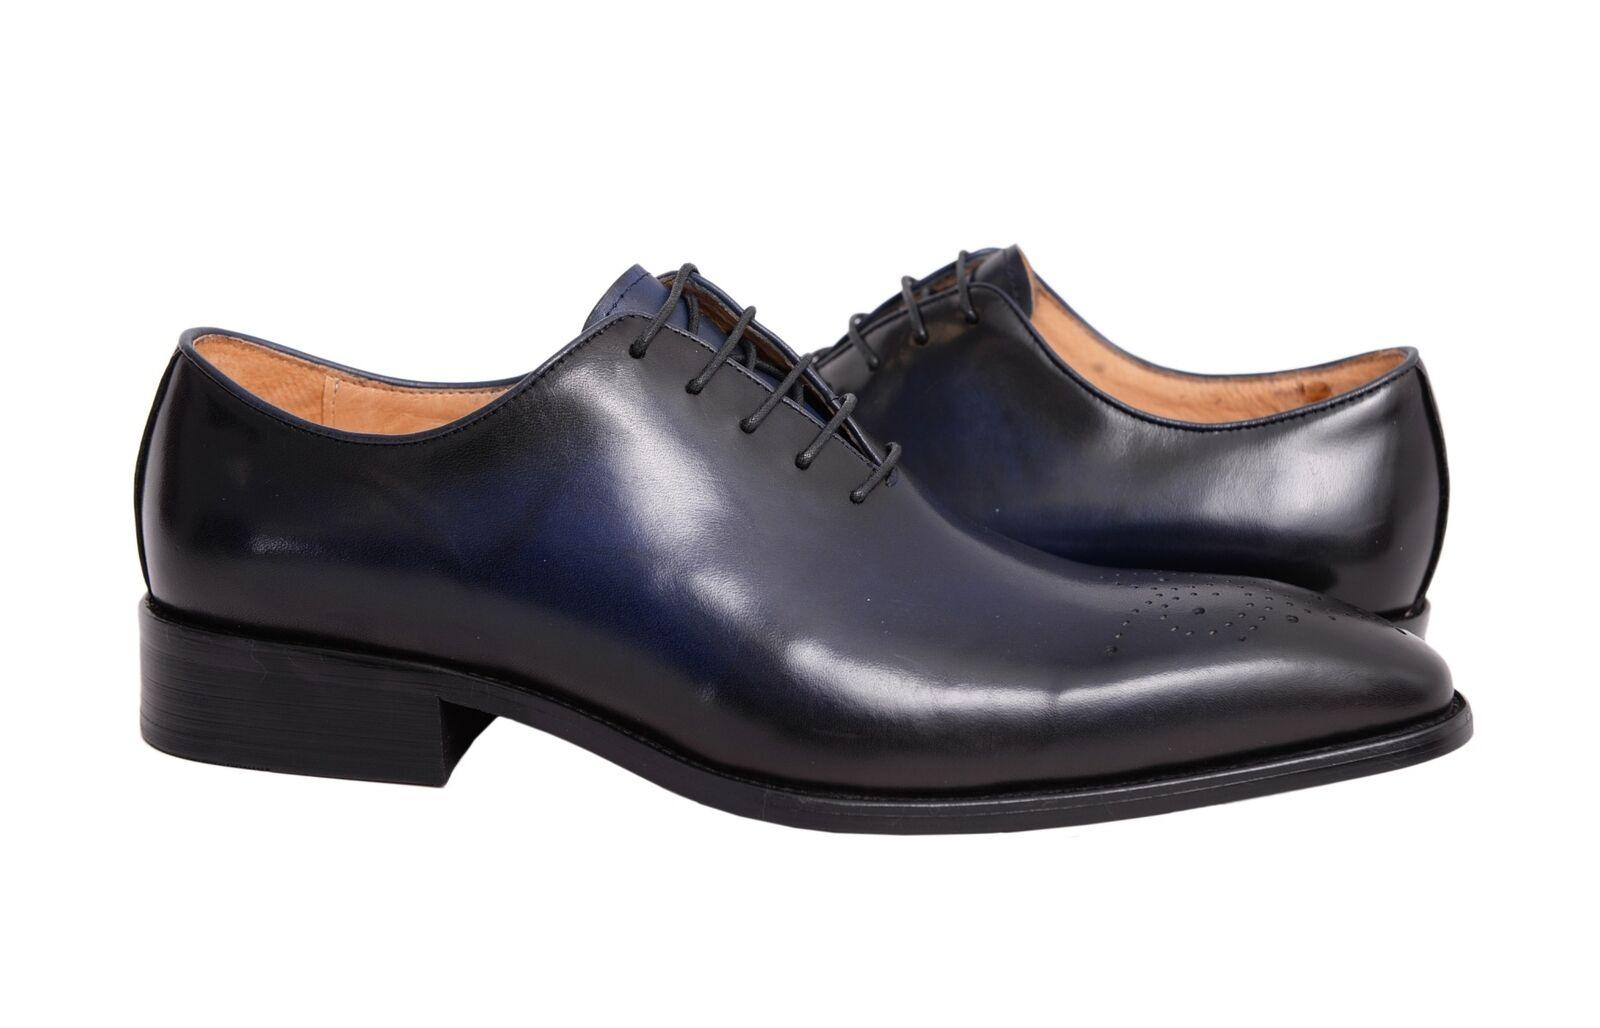 Carrucci Solides Marineblau Ganze Schnitt Oxford Leder Kleid Schuhe